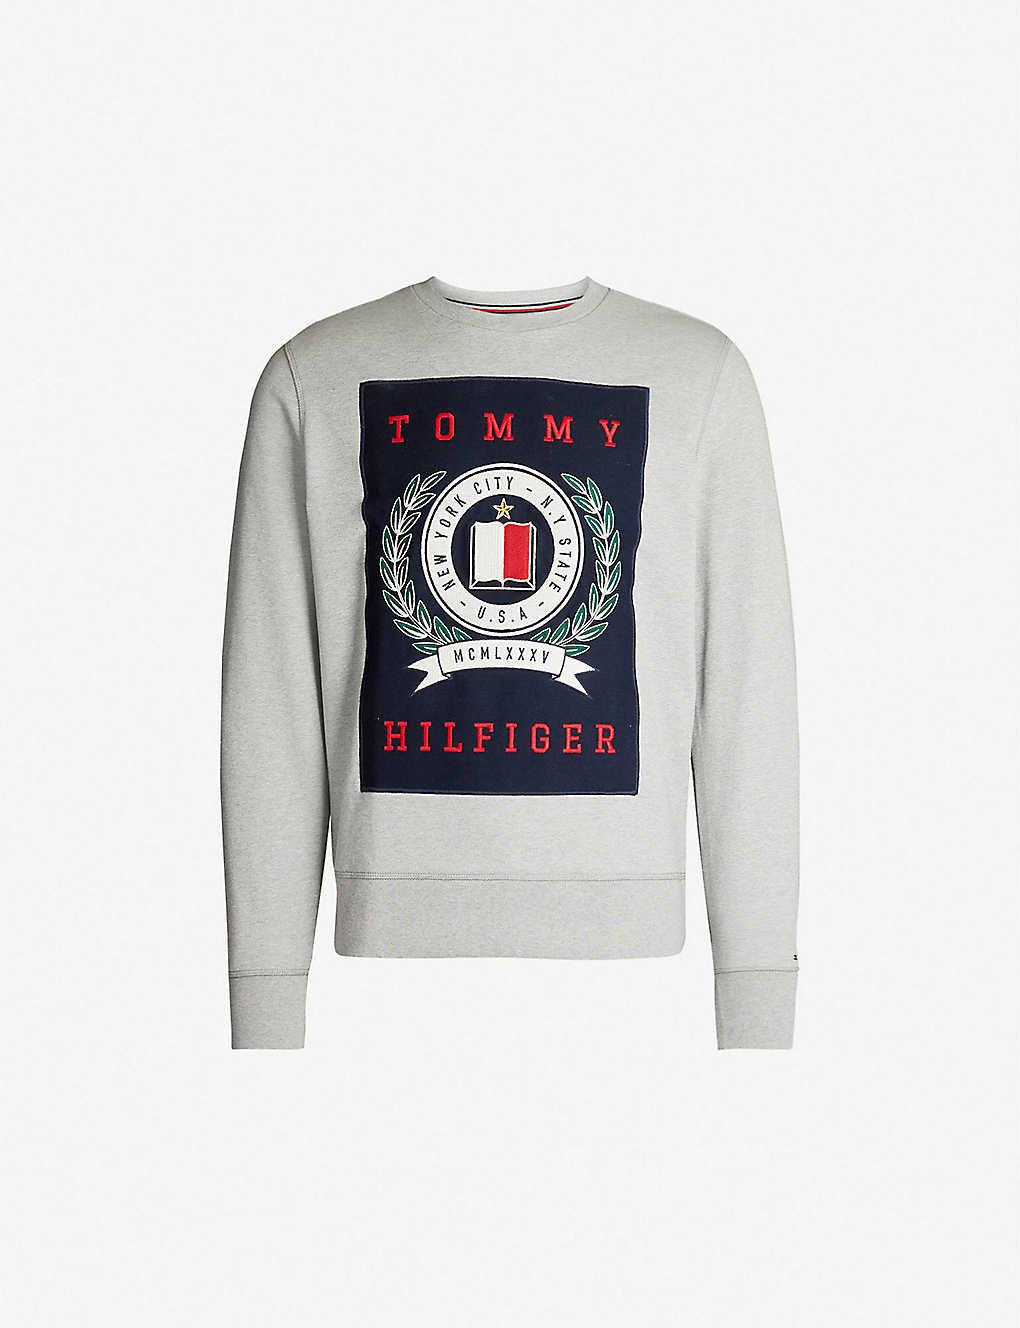 3839ed3d TOMMY HILFIGER - Crest-appliqu? cotton-jersey sweatshirt ...